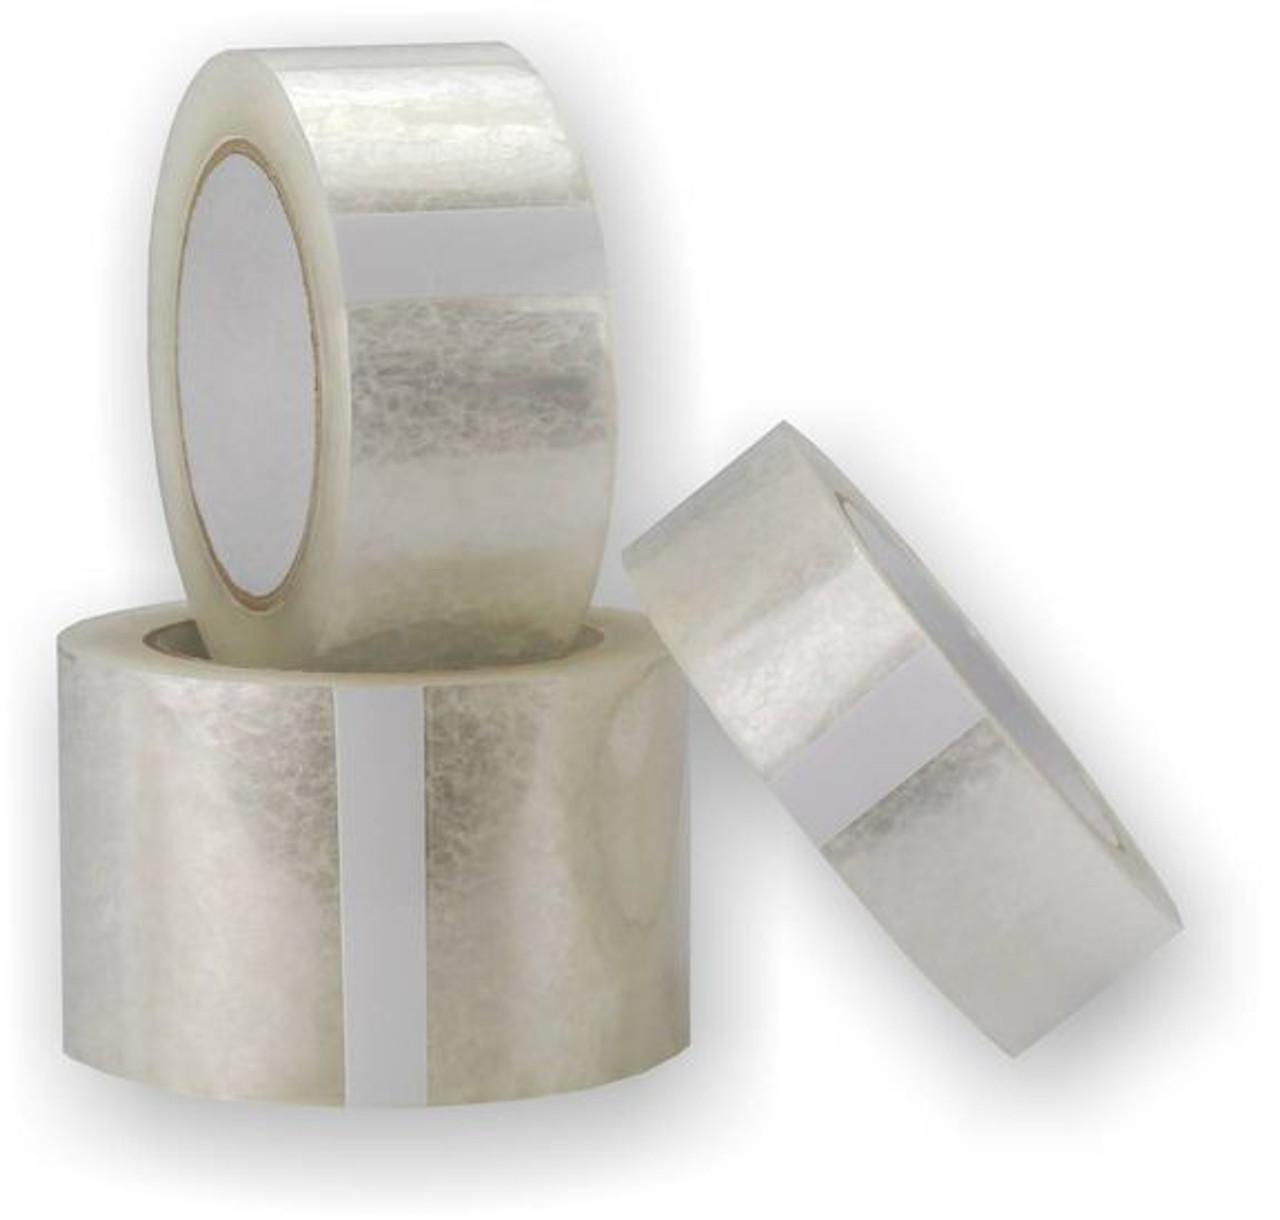 Rolls of spine tape